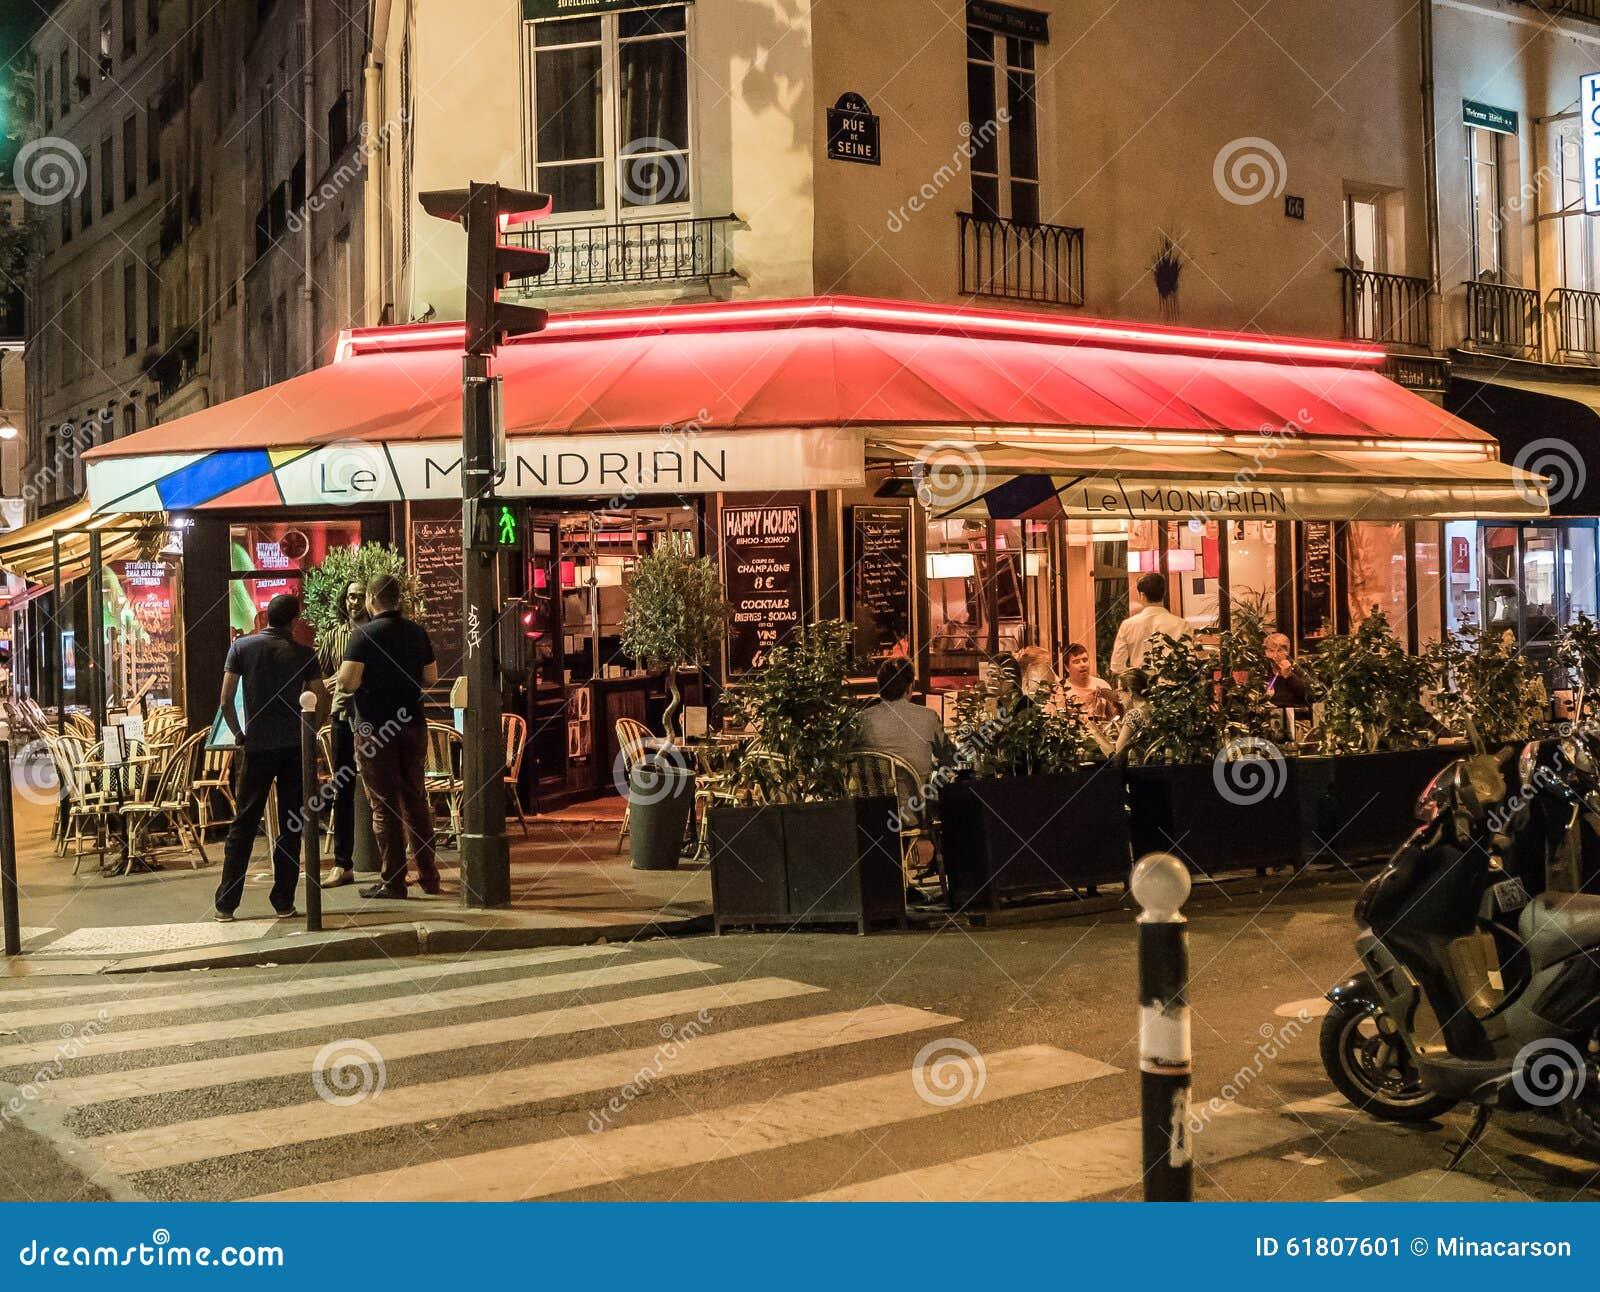 Mondrian Cafe Paris